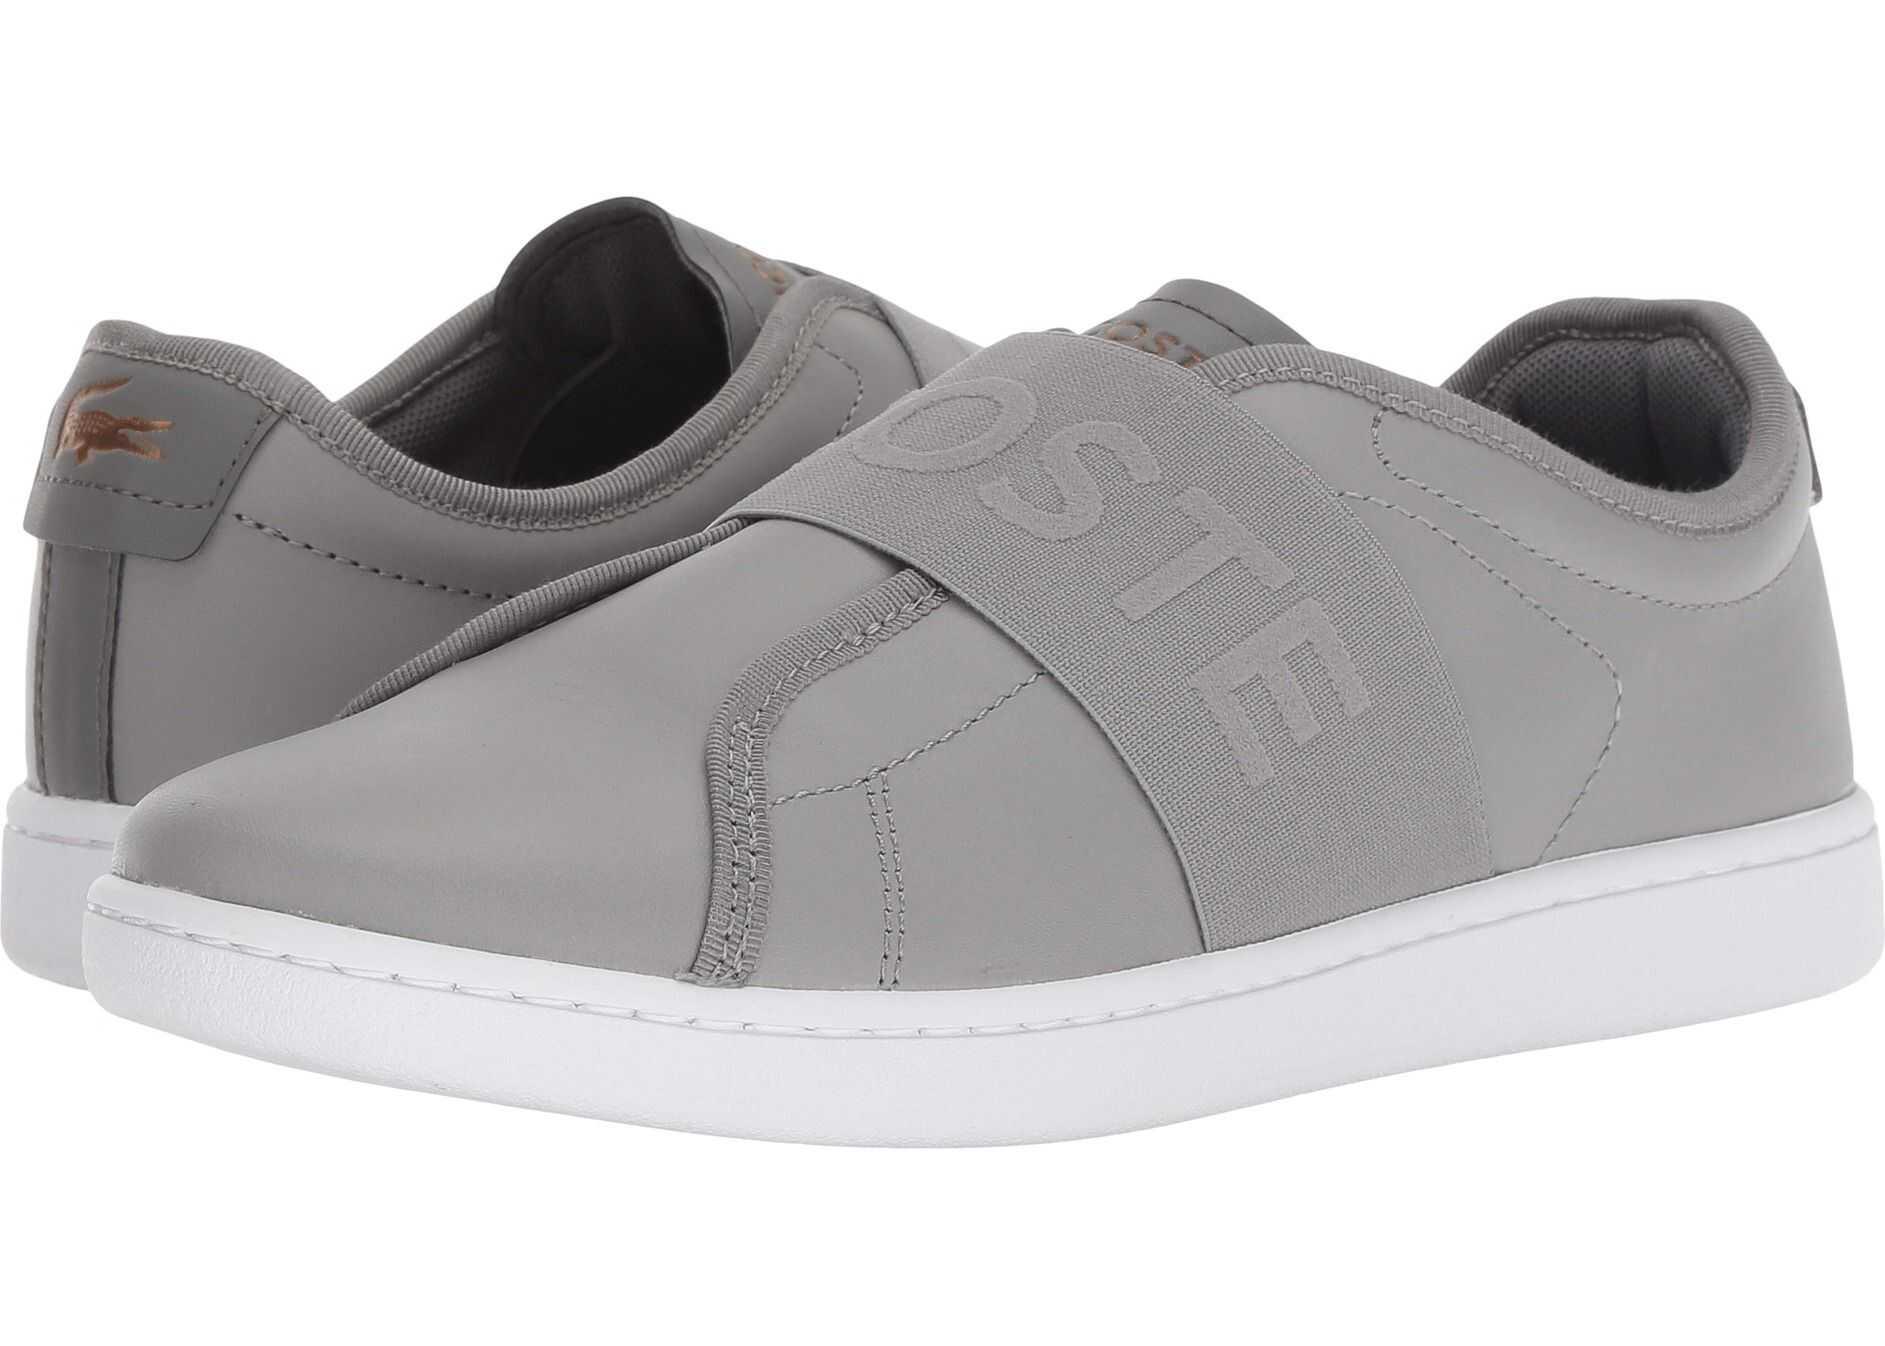 Lacoste Carnaby Evo Slip 318 1 Grey/Dark Grey